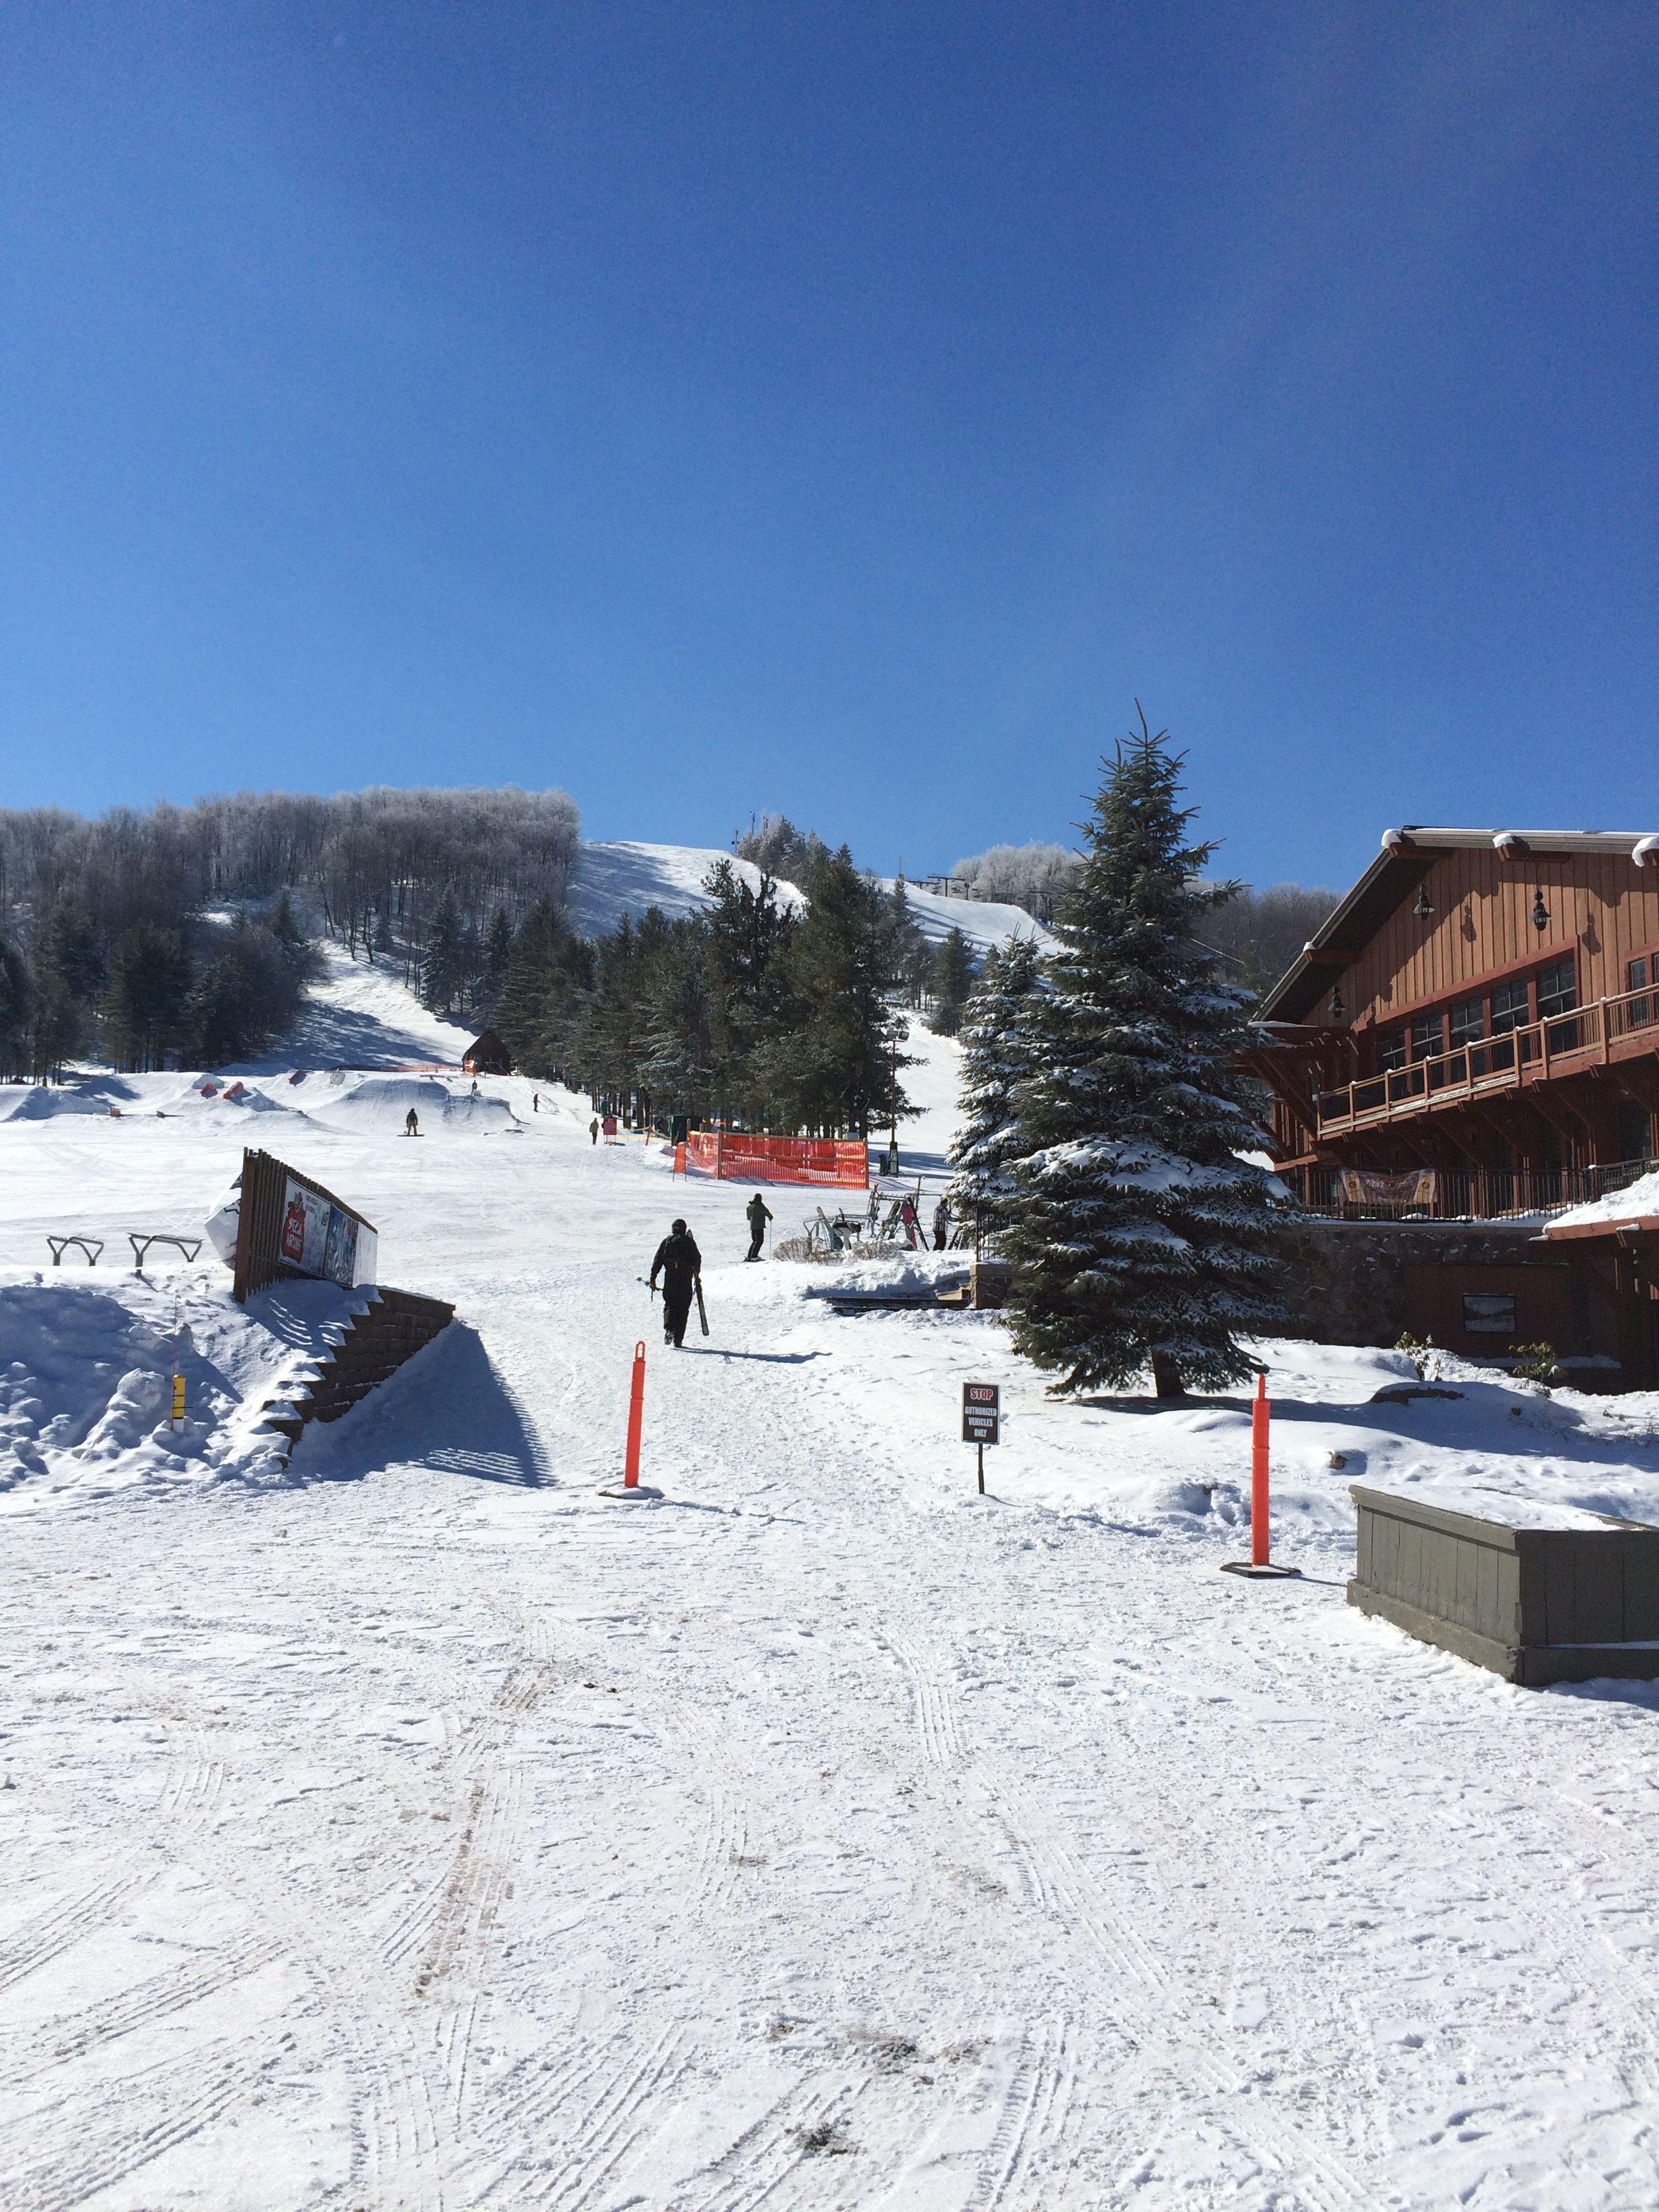 wisp ski resort, garrett county, maryland | garrett county, md